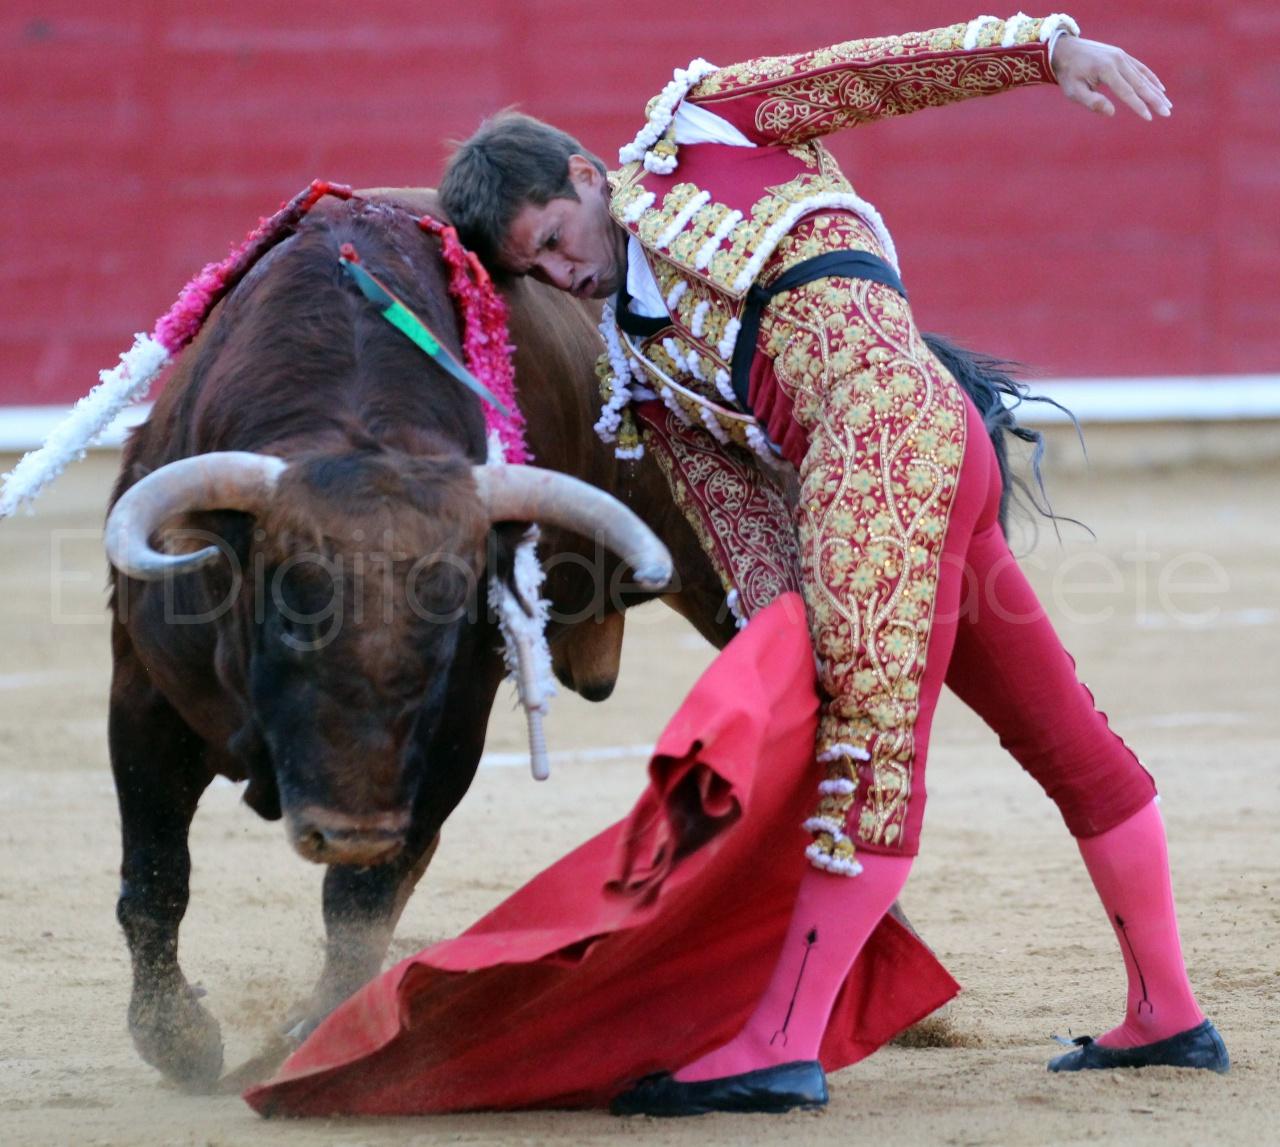 El Juli Lopez Simon y Garrido Feria Albacete 2015 toros  97